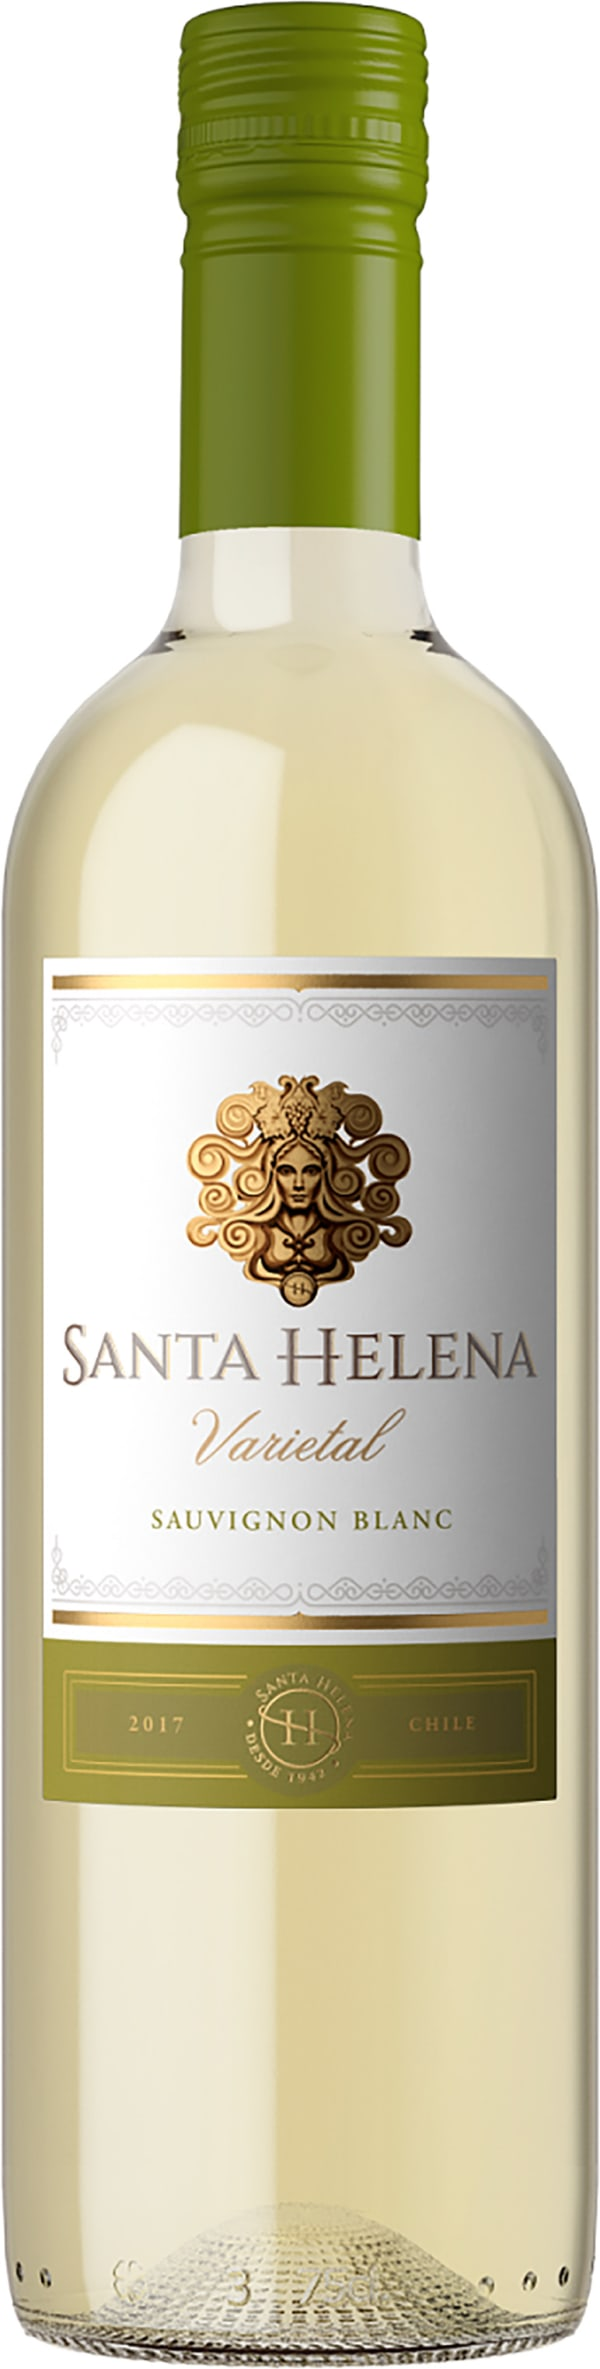 Santa Helena Varietal Sauvignon Blanc 2016